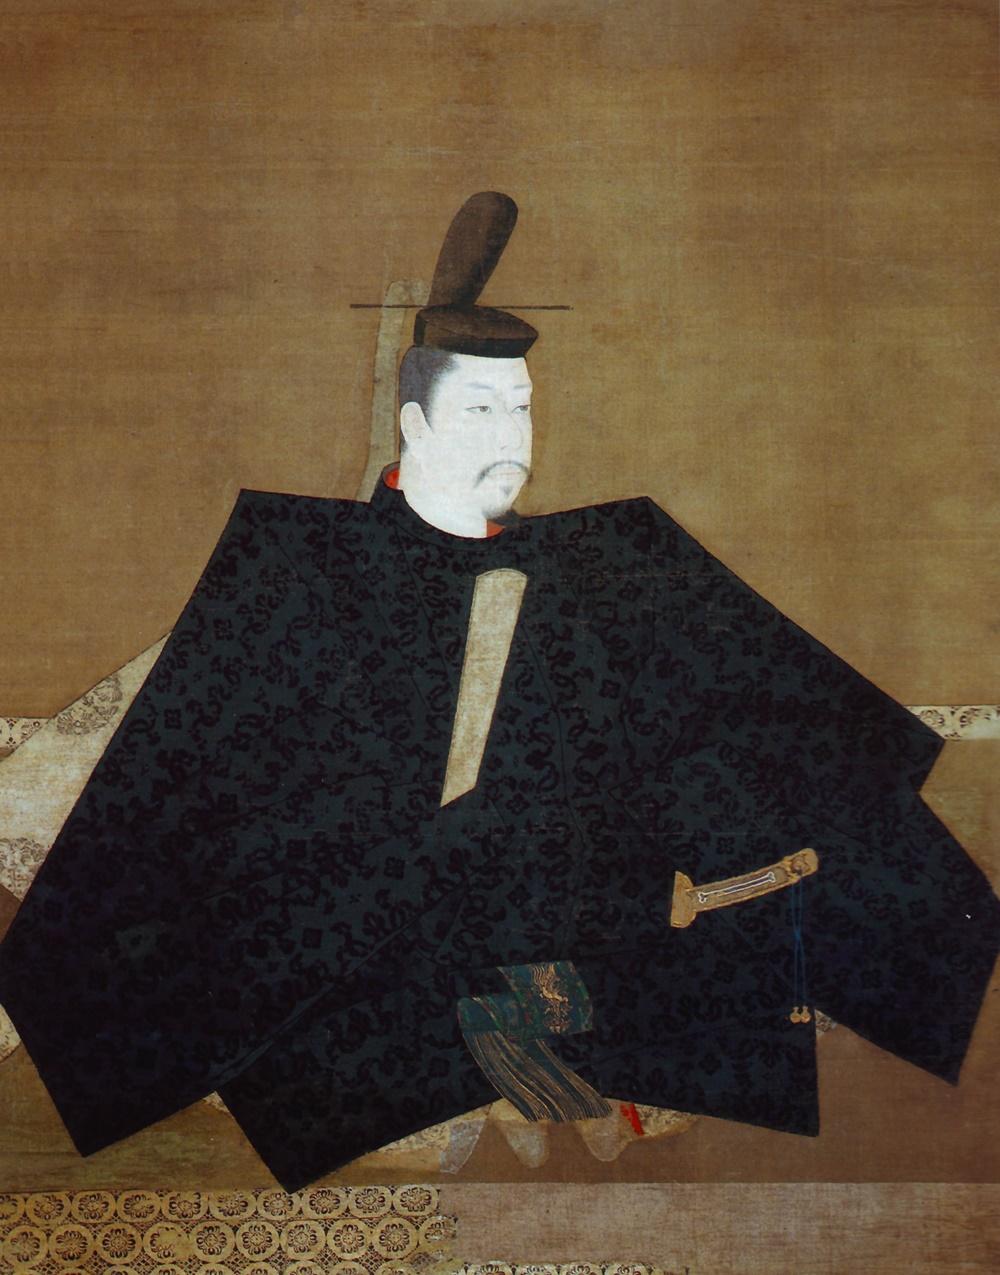 Minamoto_no_Yoritomo 源頼朝 伝源頼朝像 神護寺蔵